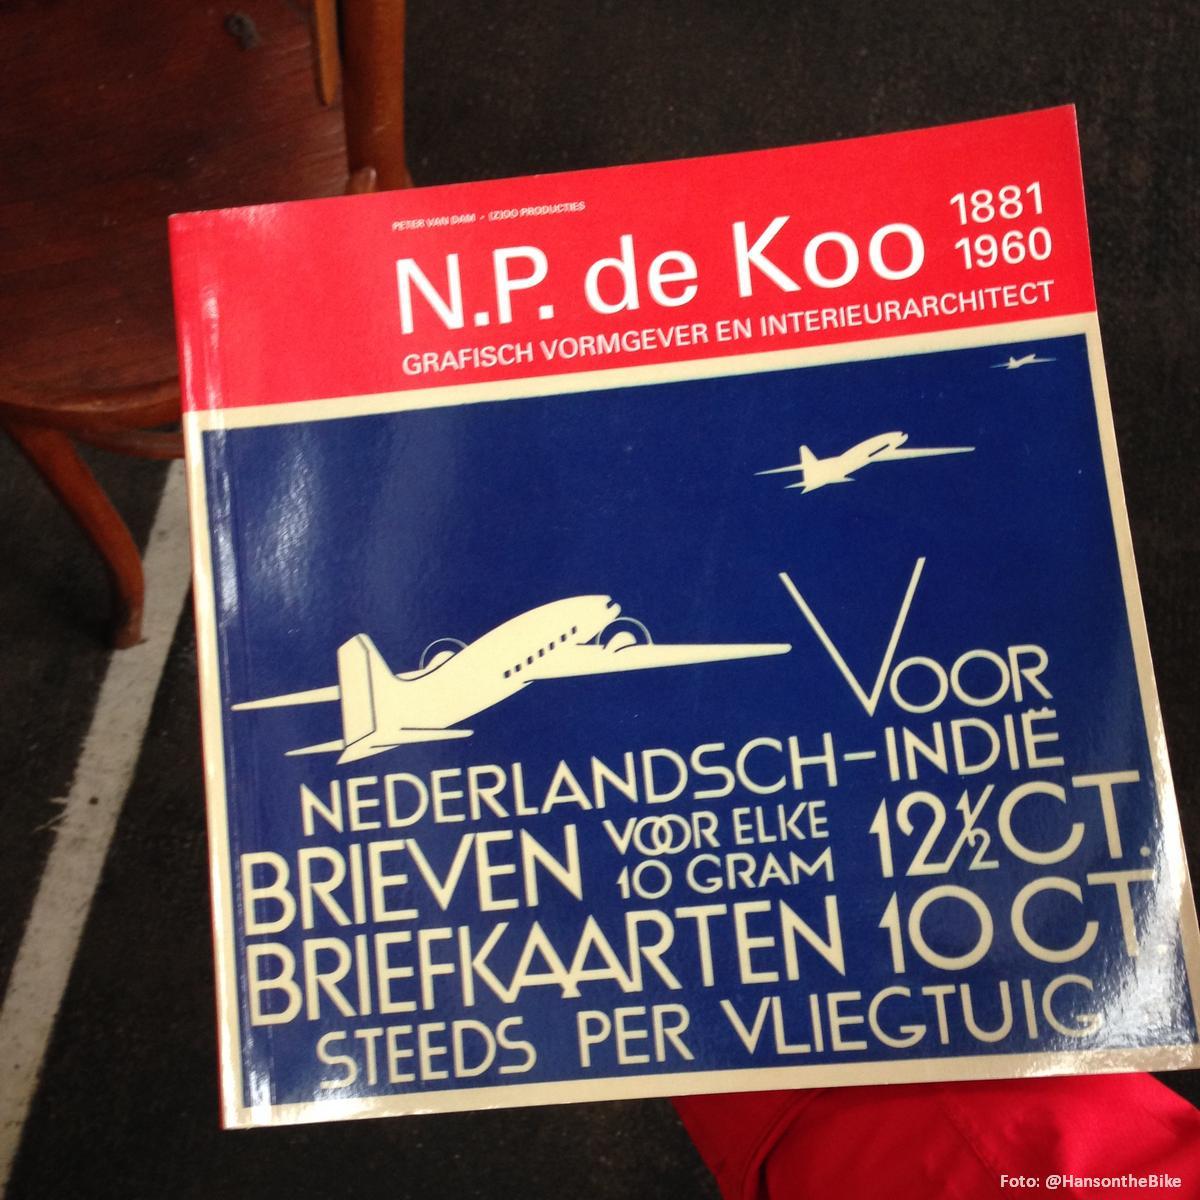 amsterdam-hansonthebike-10